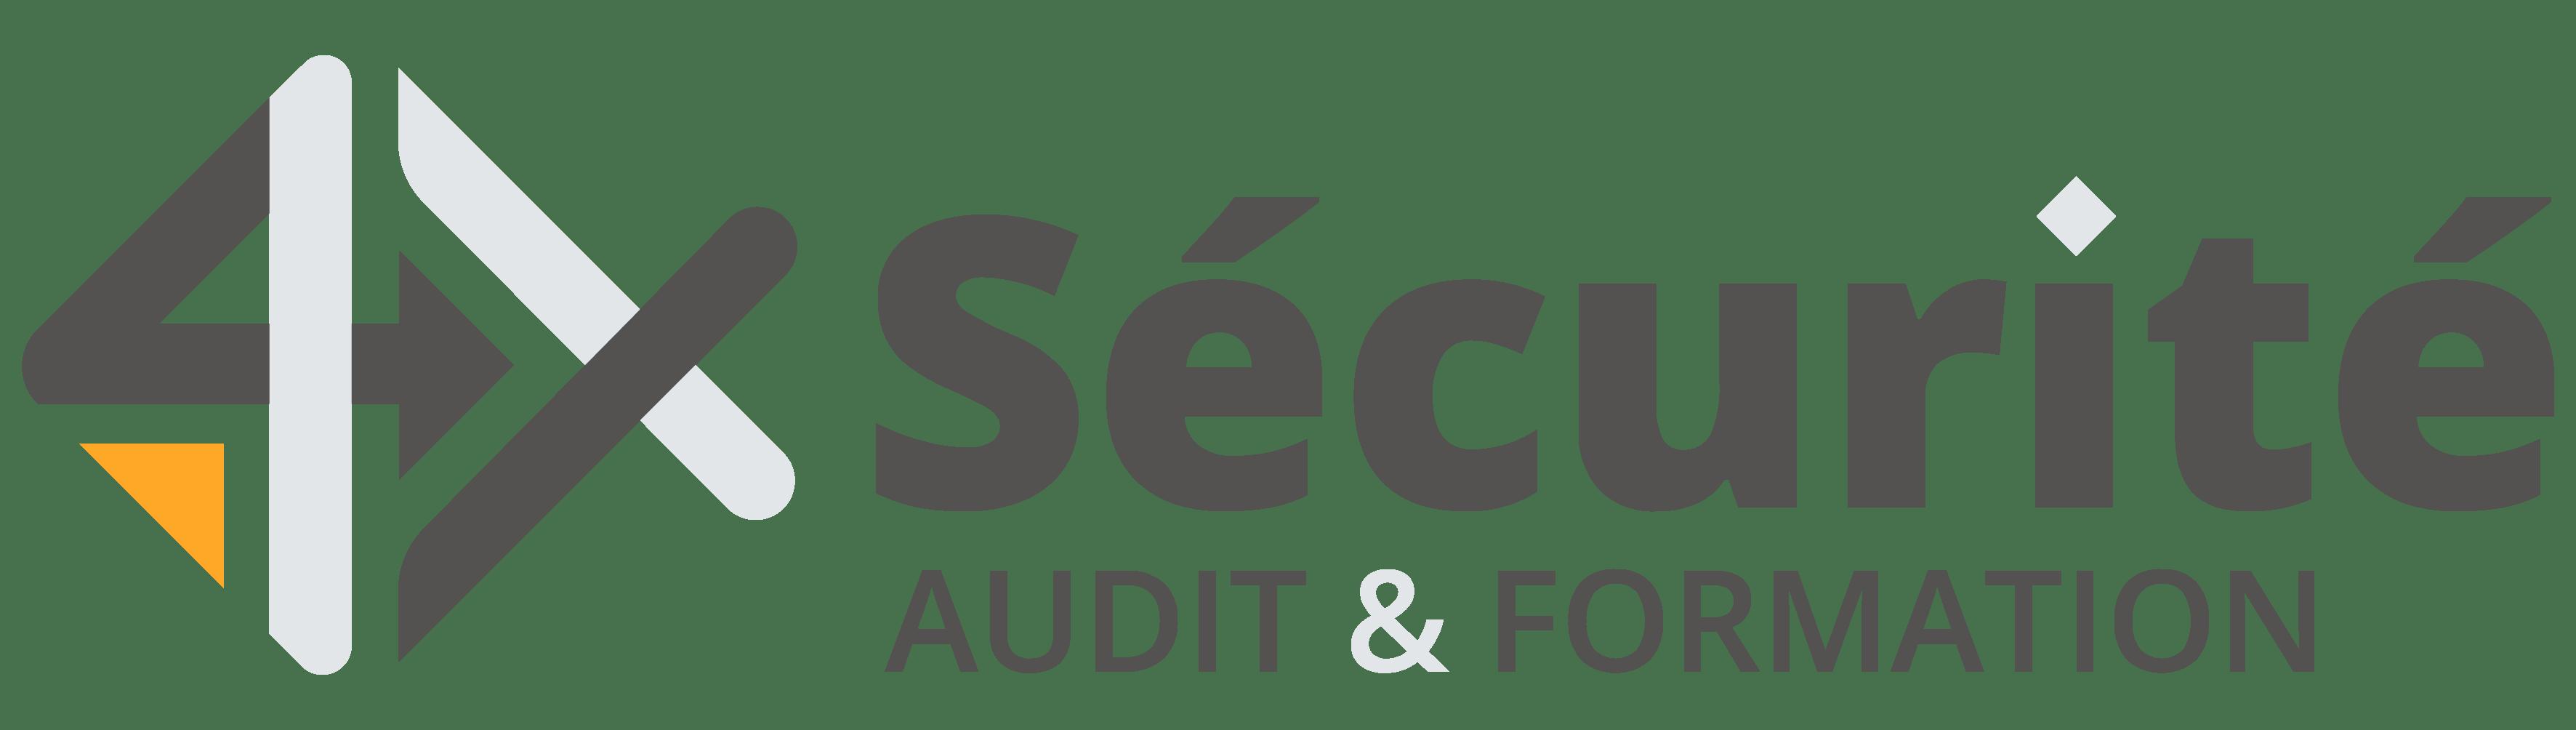 4xSecurite logo clair horizontal baseline gris